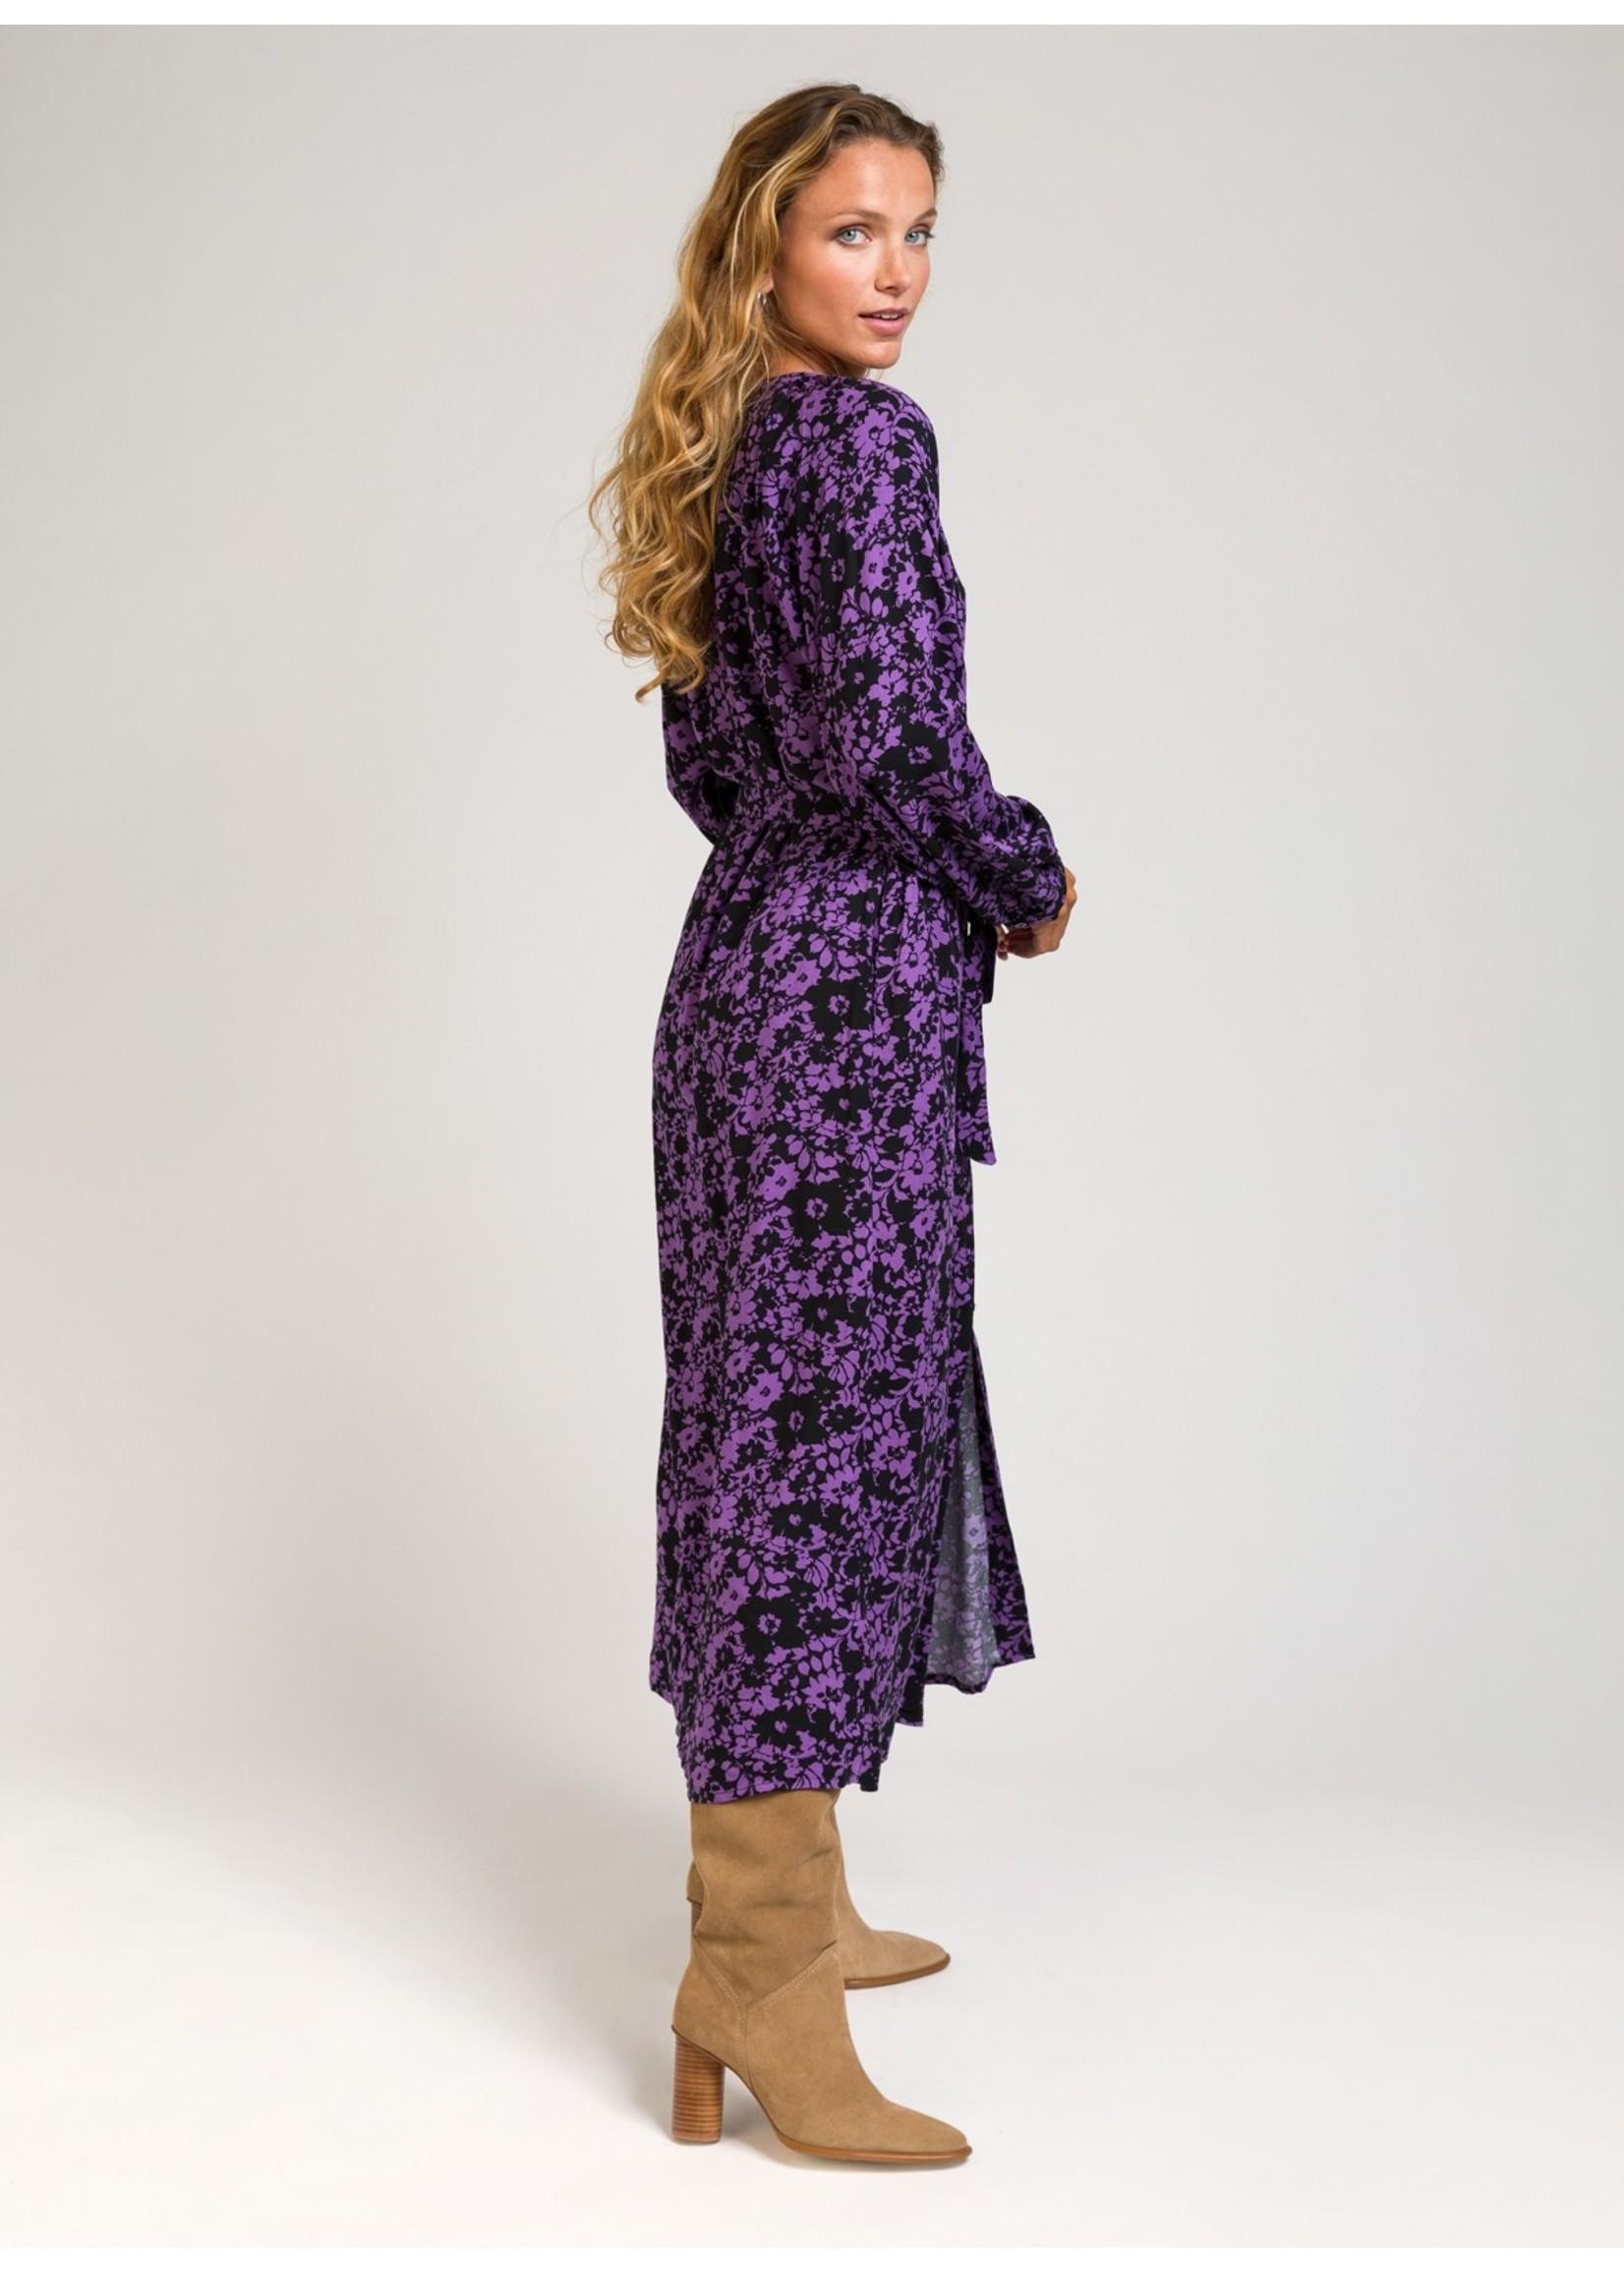 An'ge An'ge dress purple